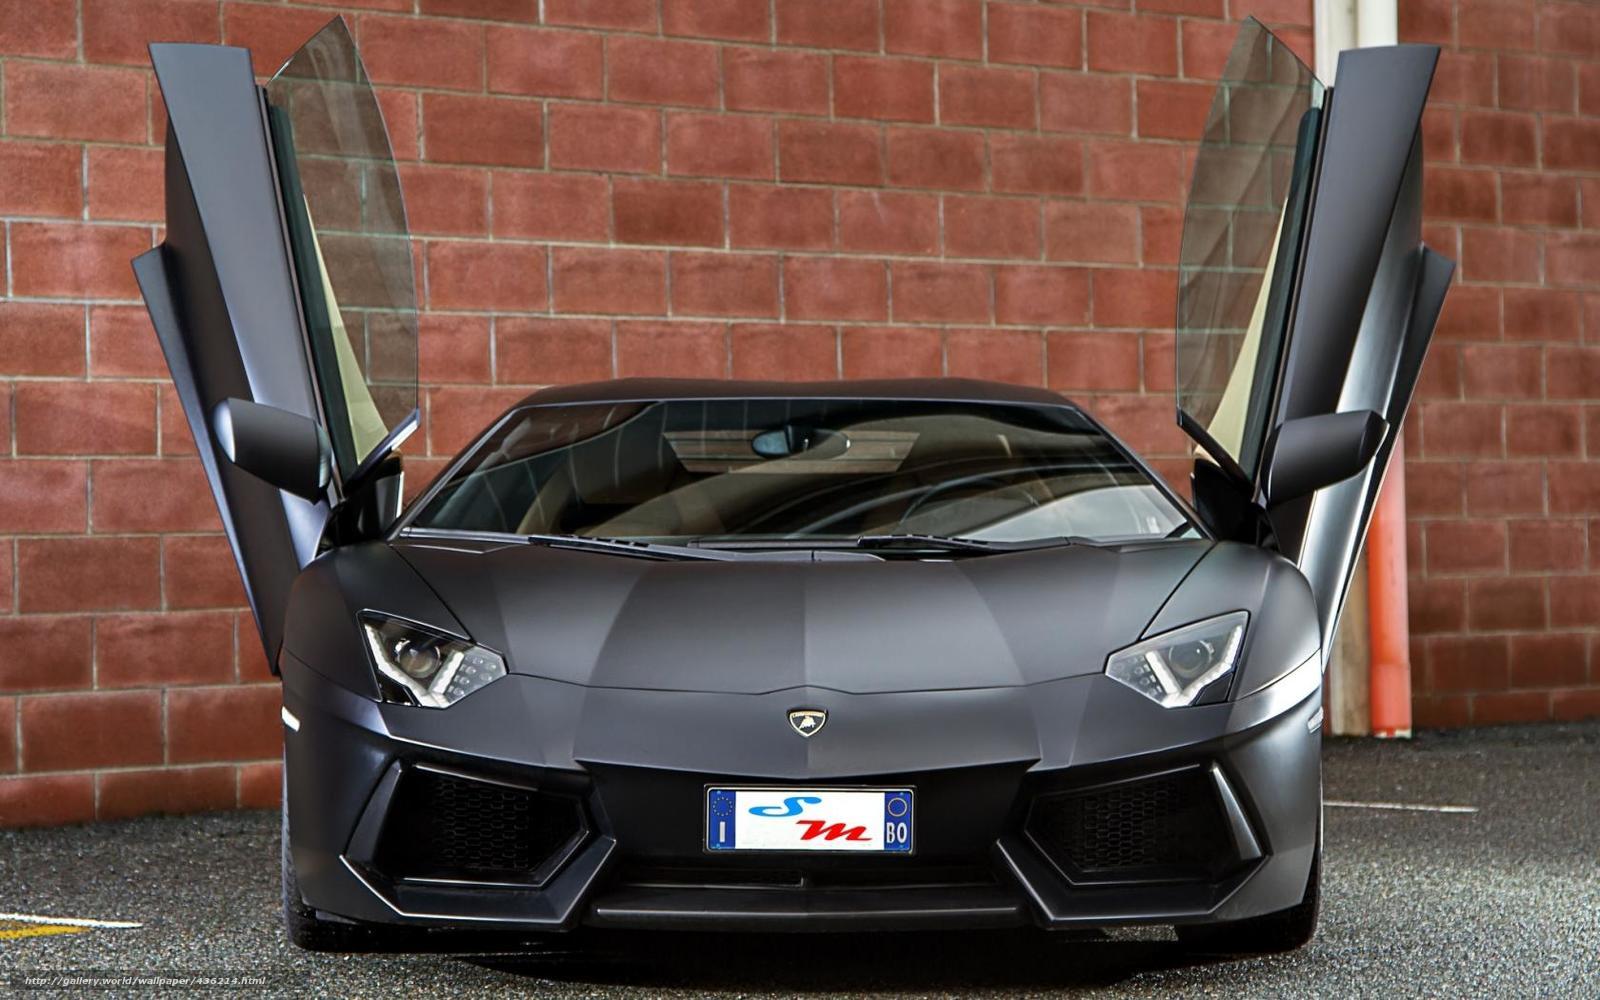 Descargar Gratis Lamborghini Aventador Negro Mate HD Wallpapers Download free images and photos [musssic.tk]